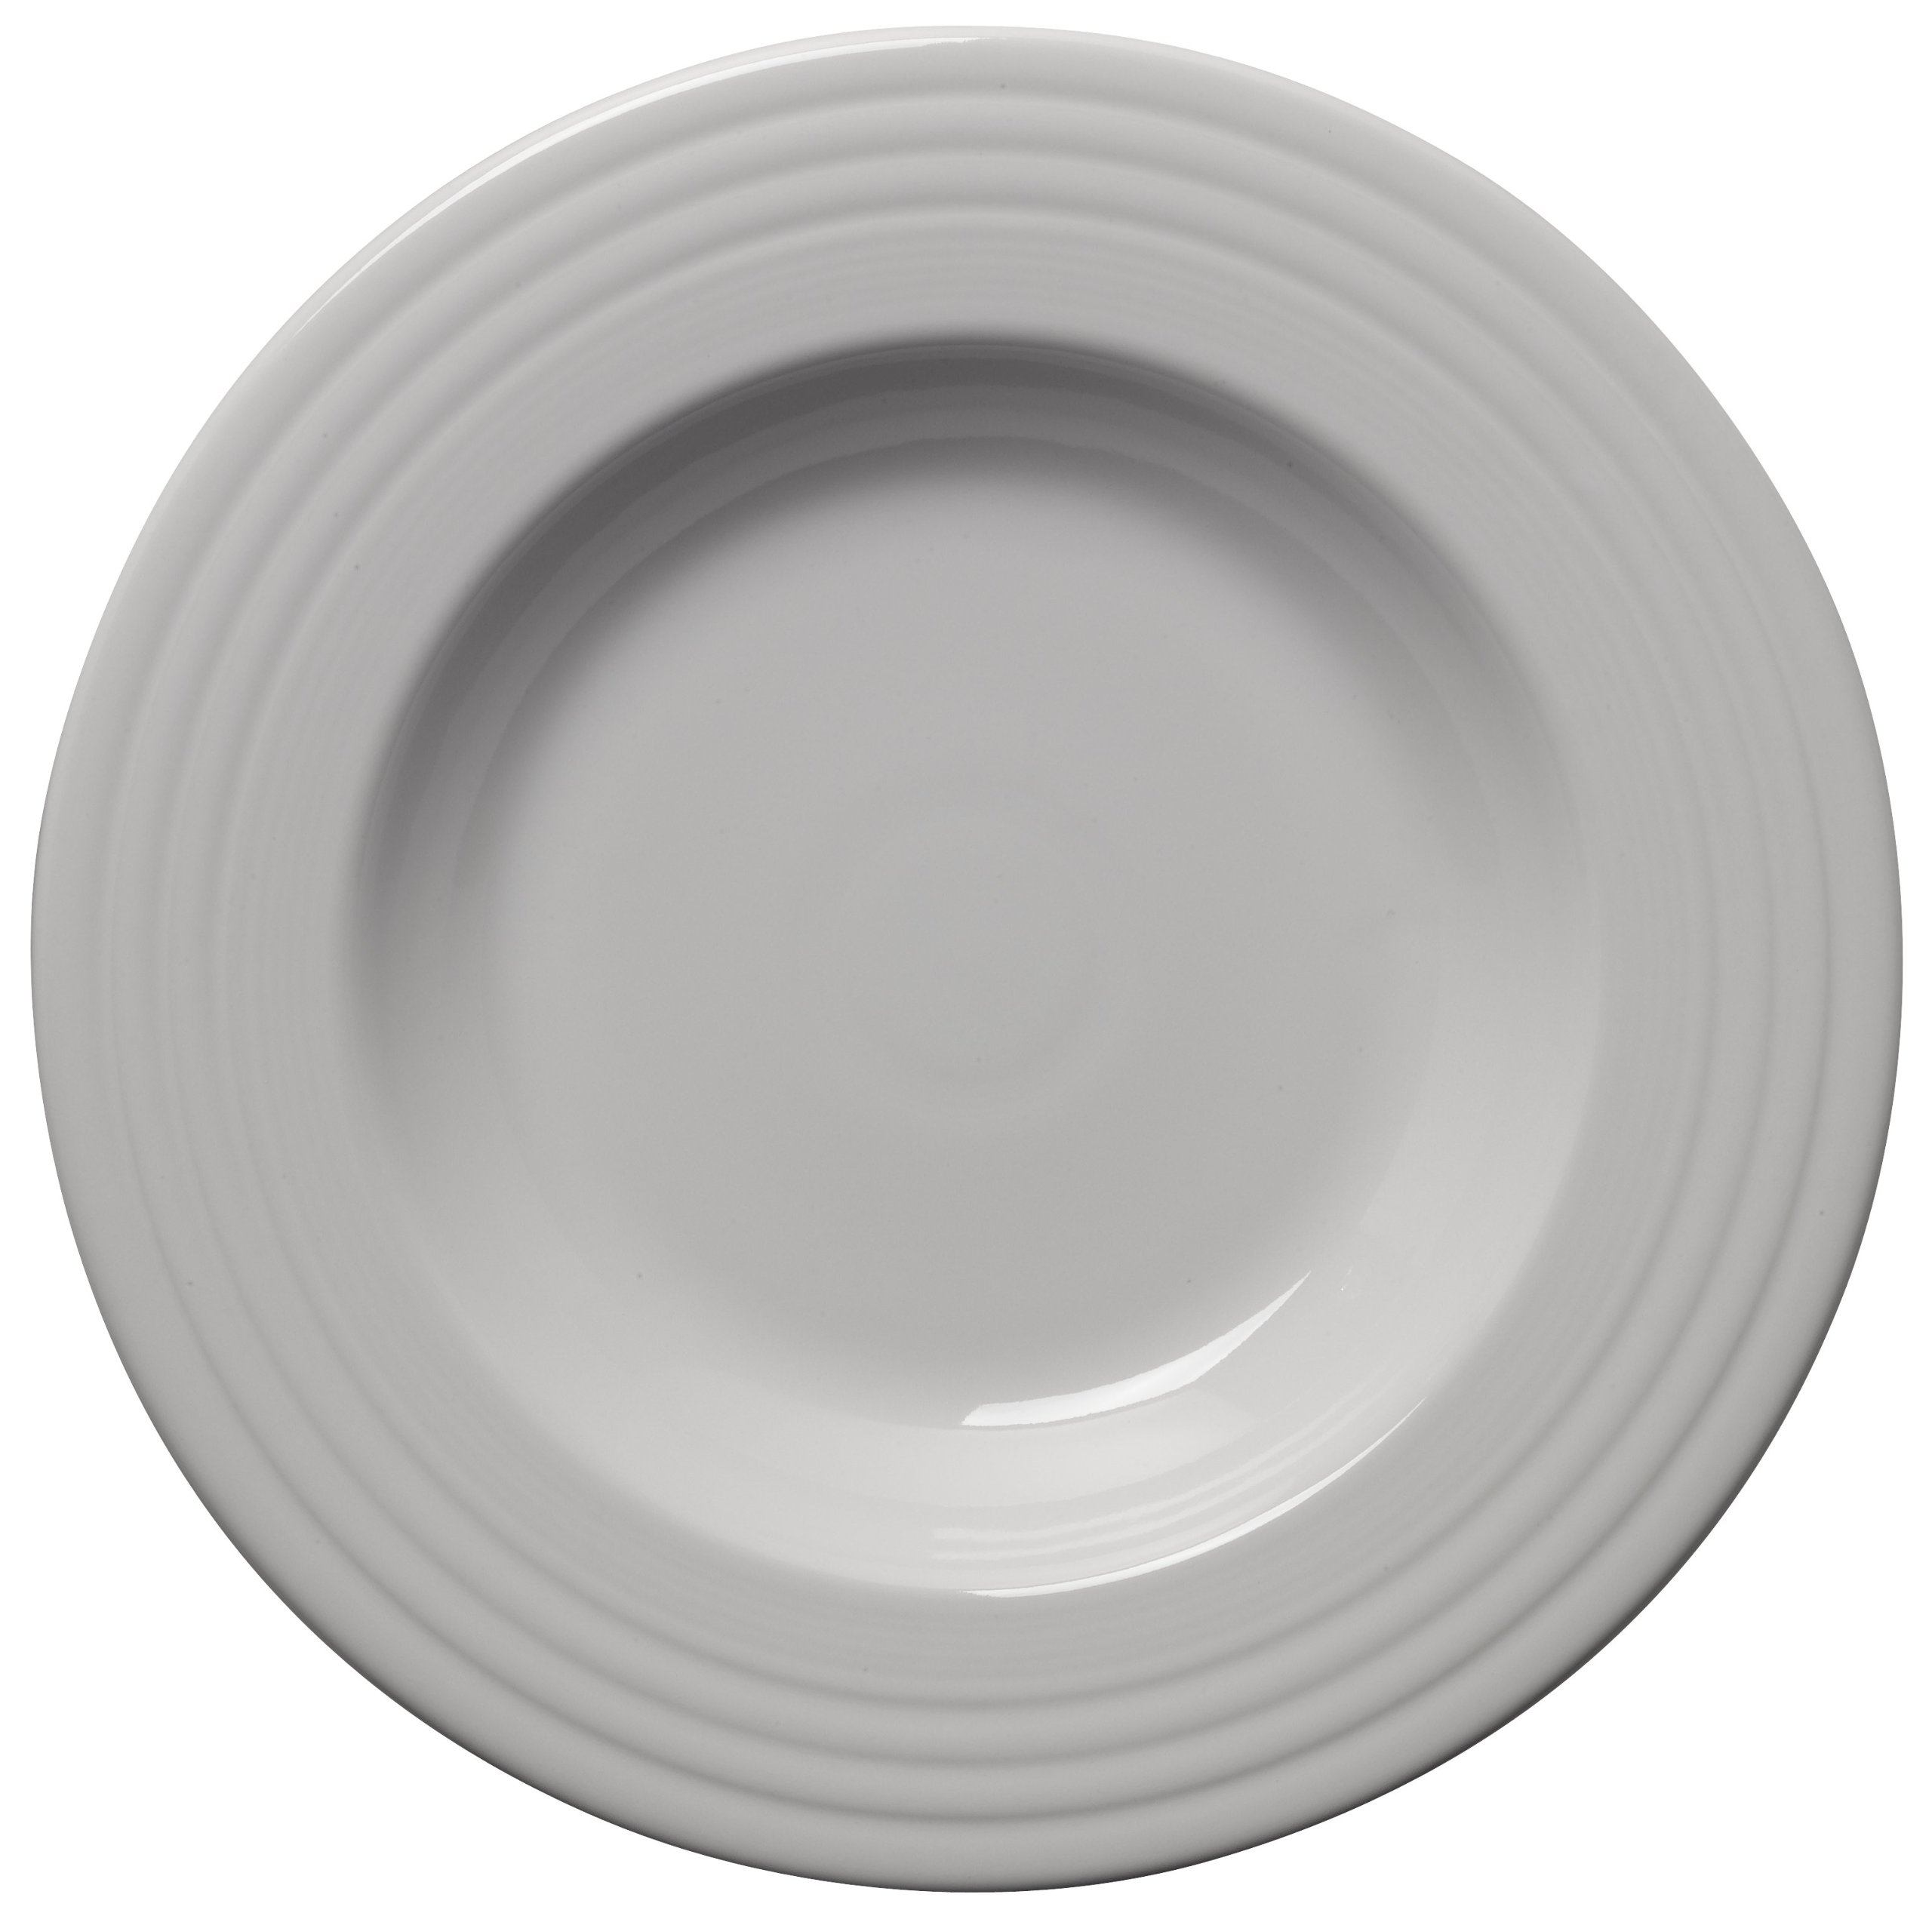 Fiesta 12-Inch Pasta Bowl, White